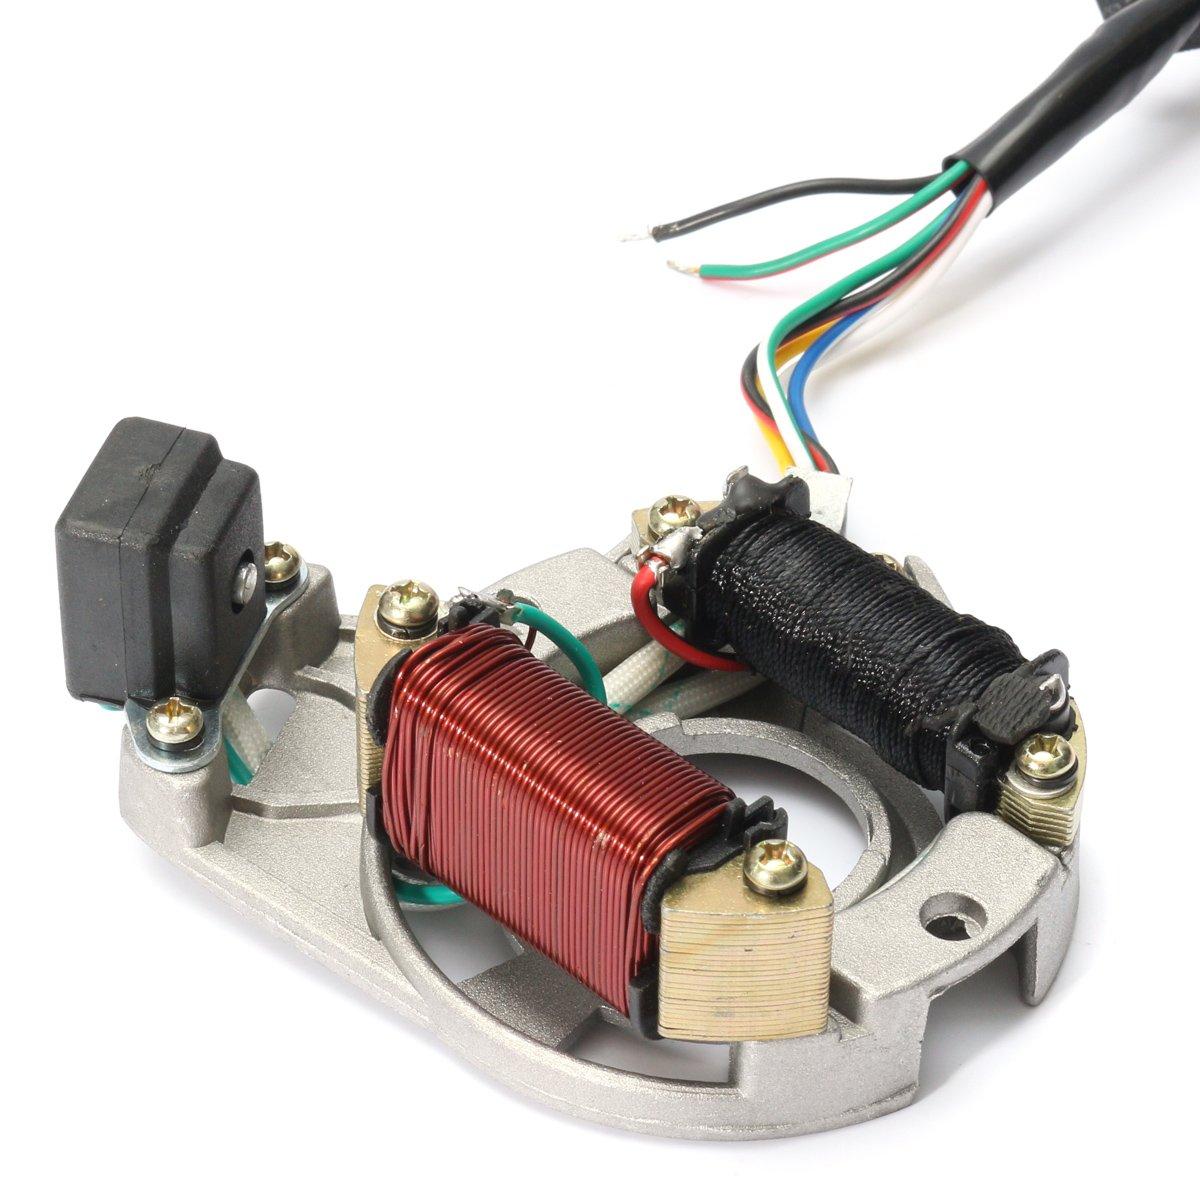 Amazon.com : 50cc 70cc 90cc 110cc CDI Wire Harness Assembly Wiring Kit ATV  Electric Start QUAD : Everything Else